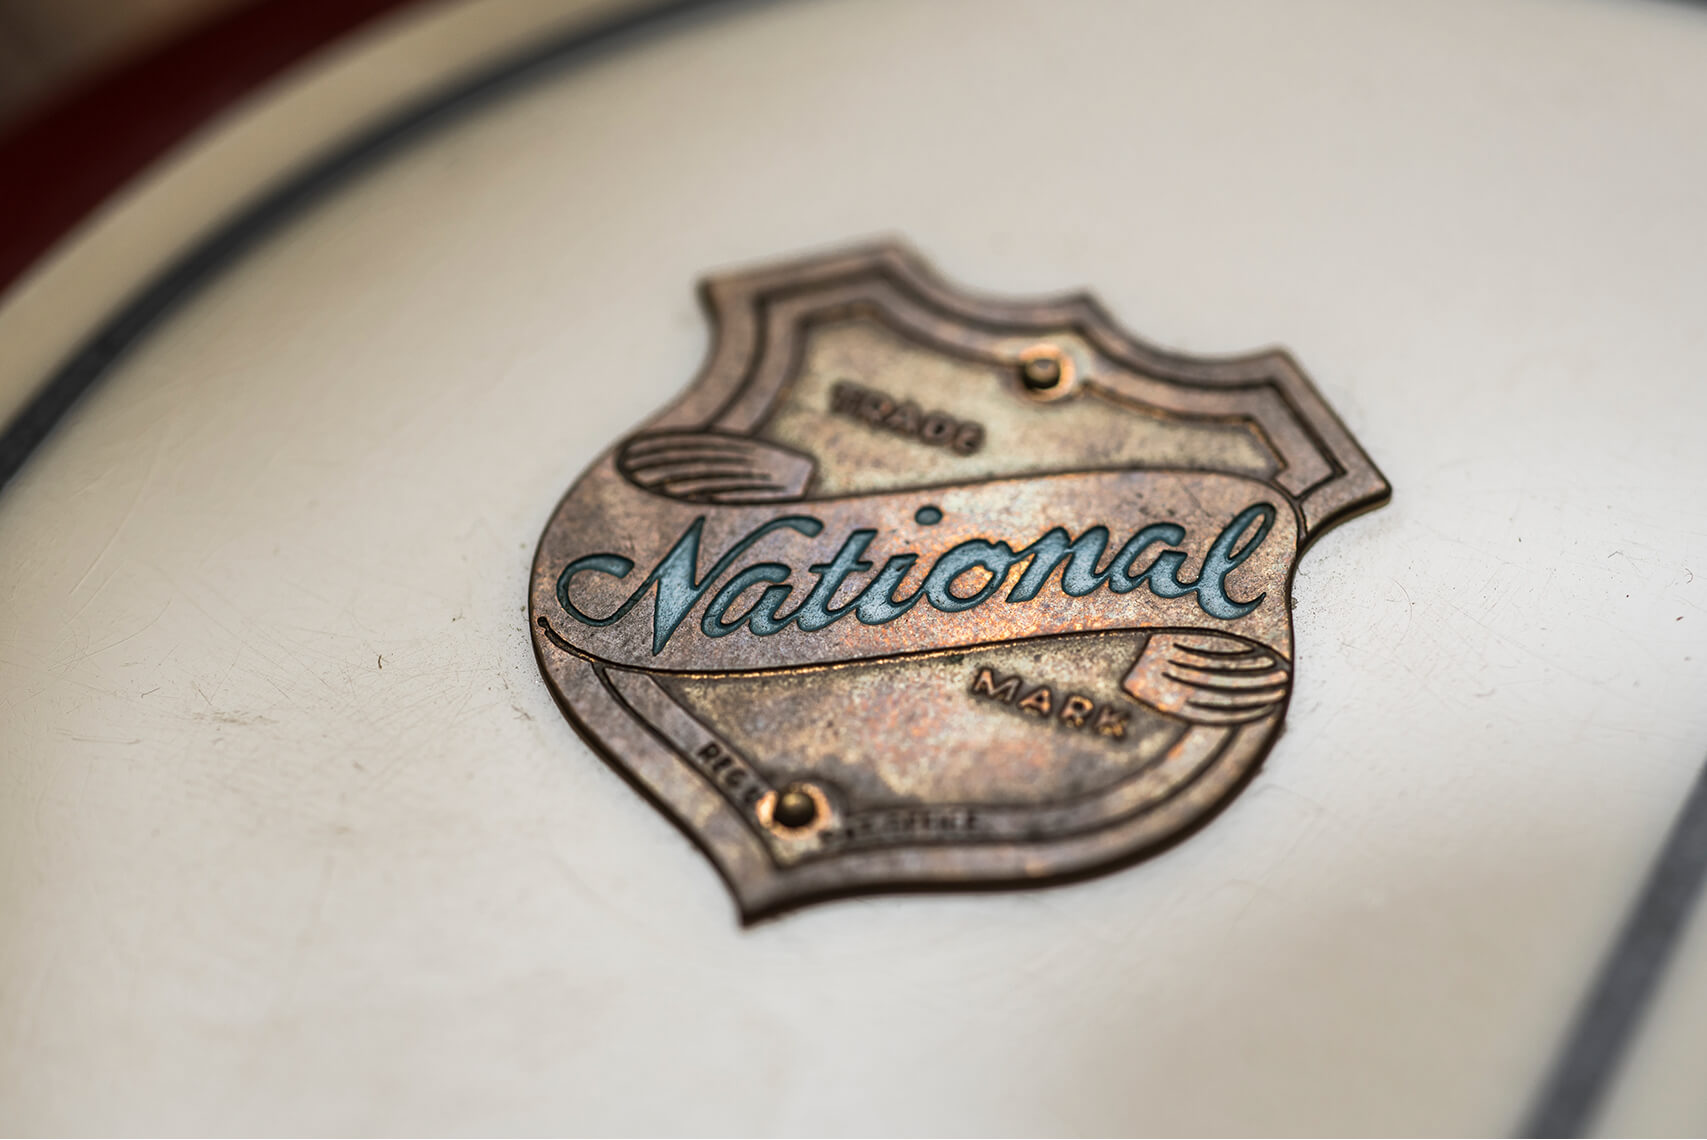 Tyler Bryant's National Reso-Phonic (Badge)